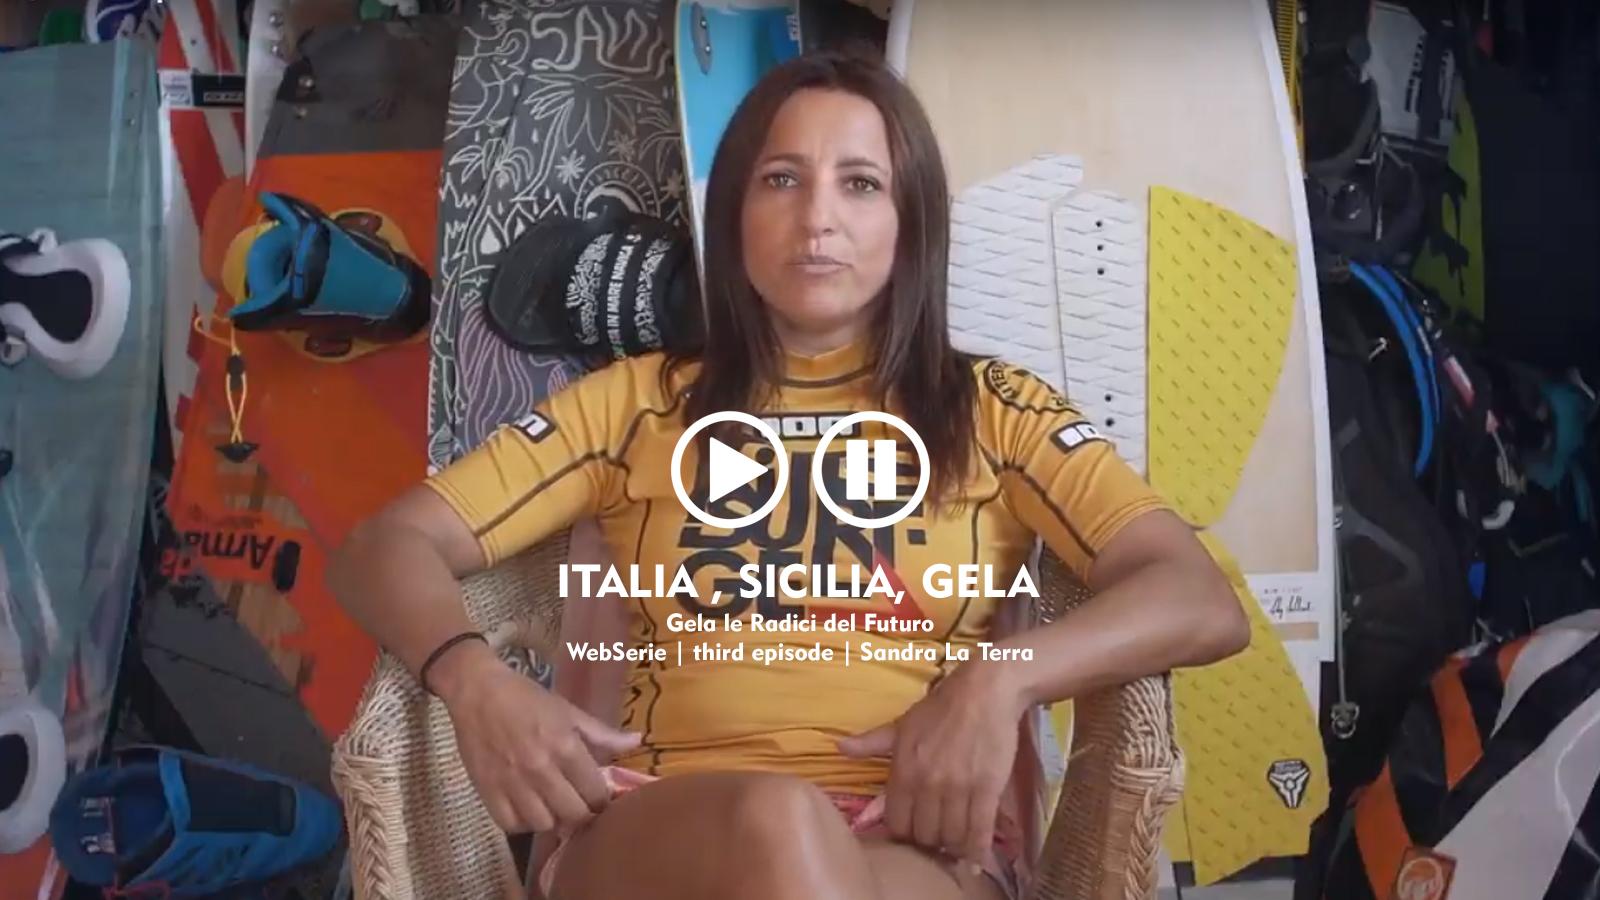 webserie | italia, sicilia, gela | third episode | sandra